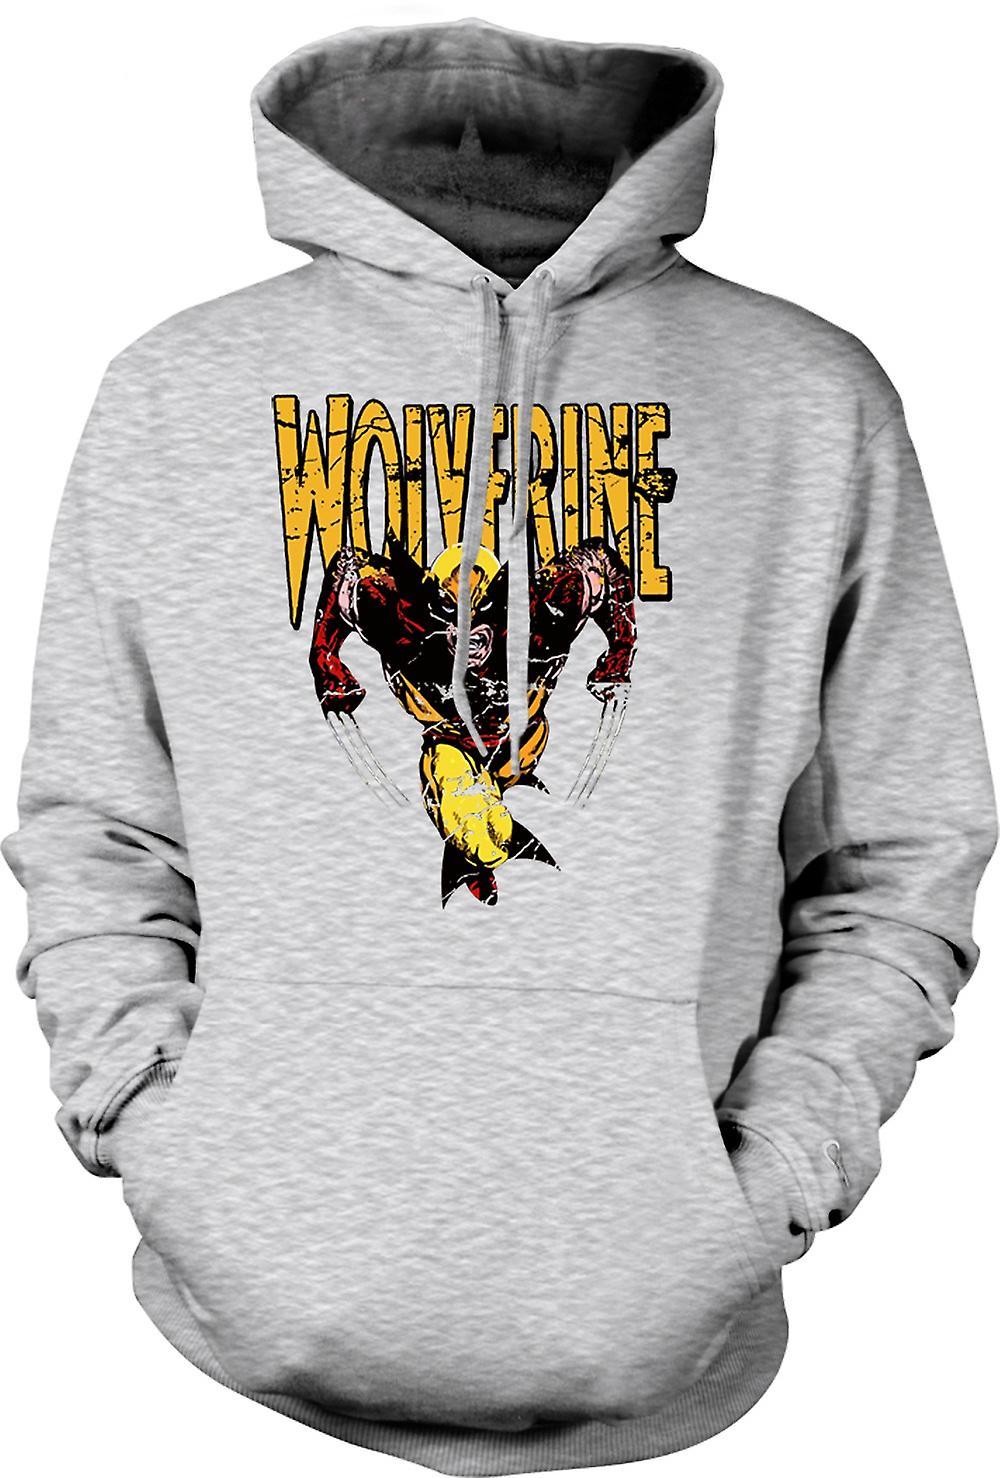 Mens Hoodie - Wolverine - klassische Comic-Held